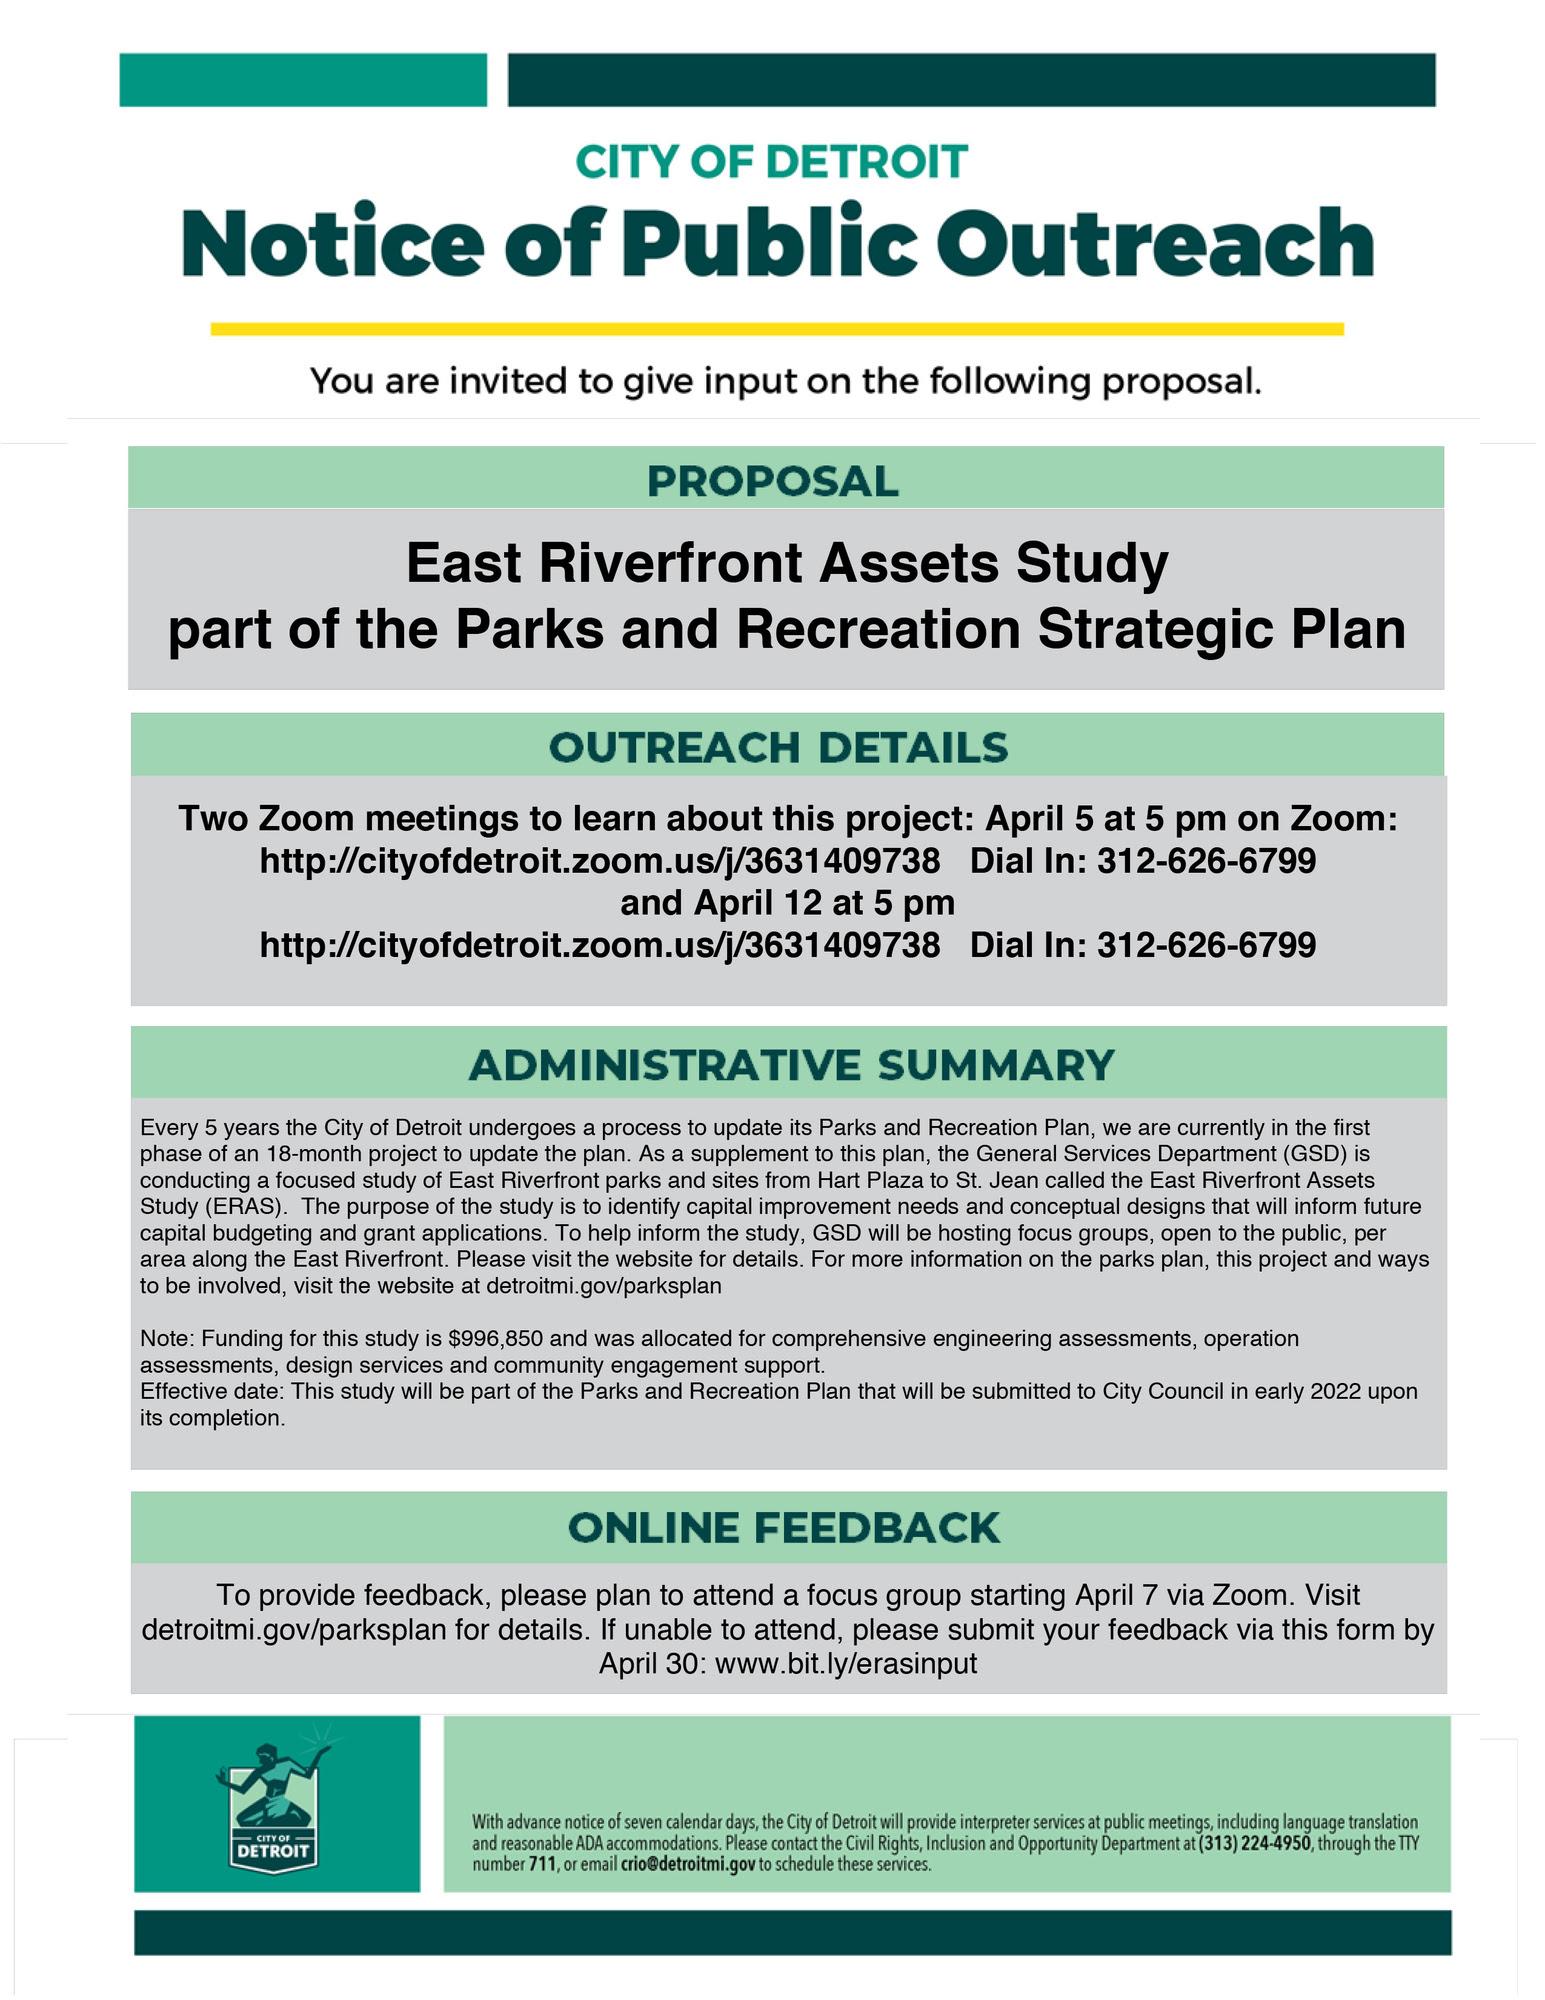 East Riverfront Assets Study April 5 & 12 Meetings